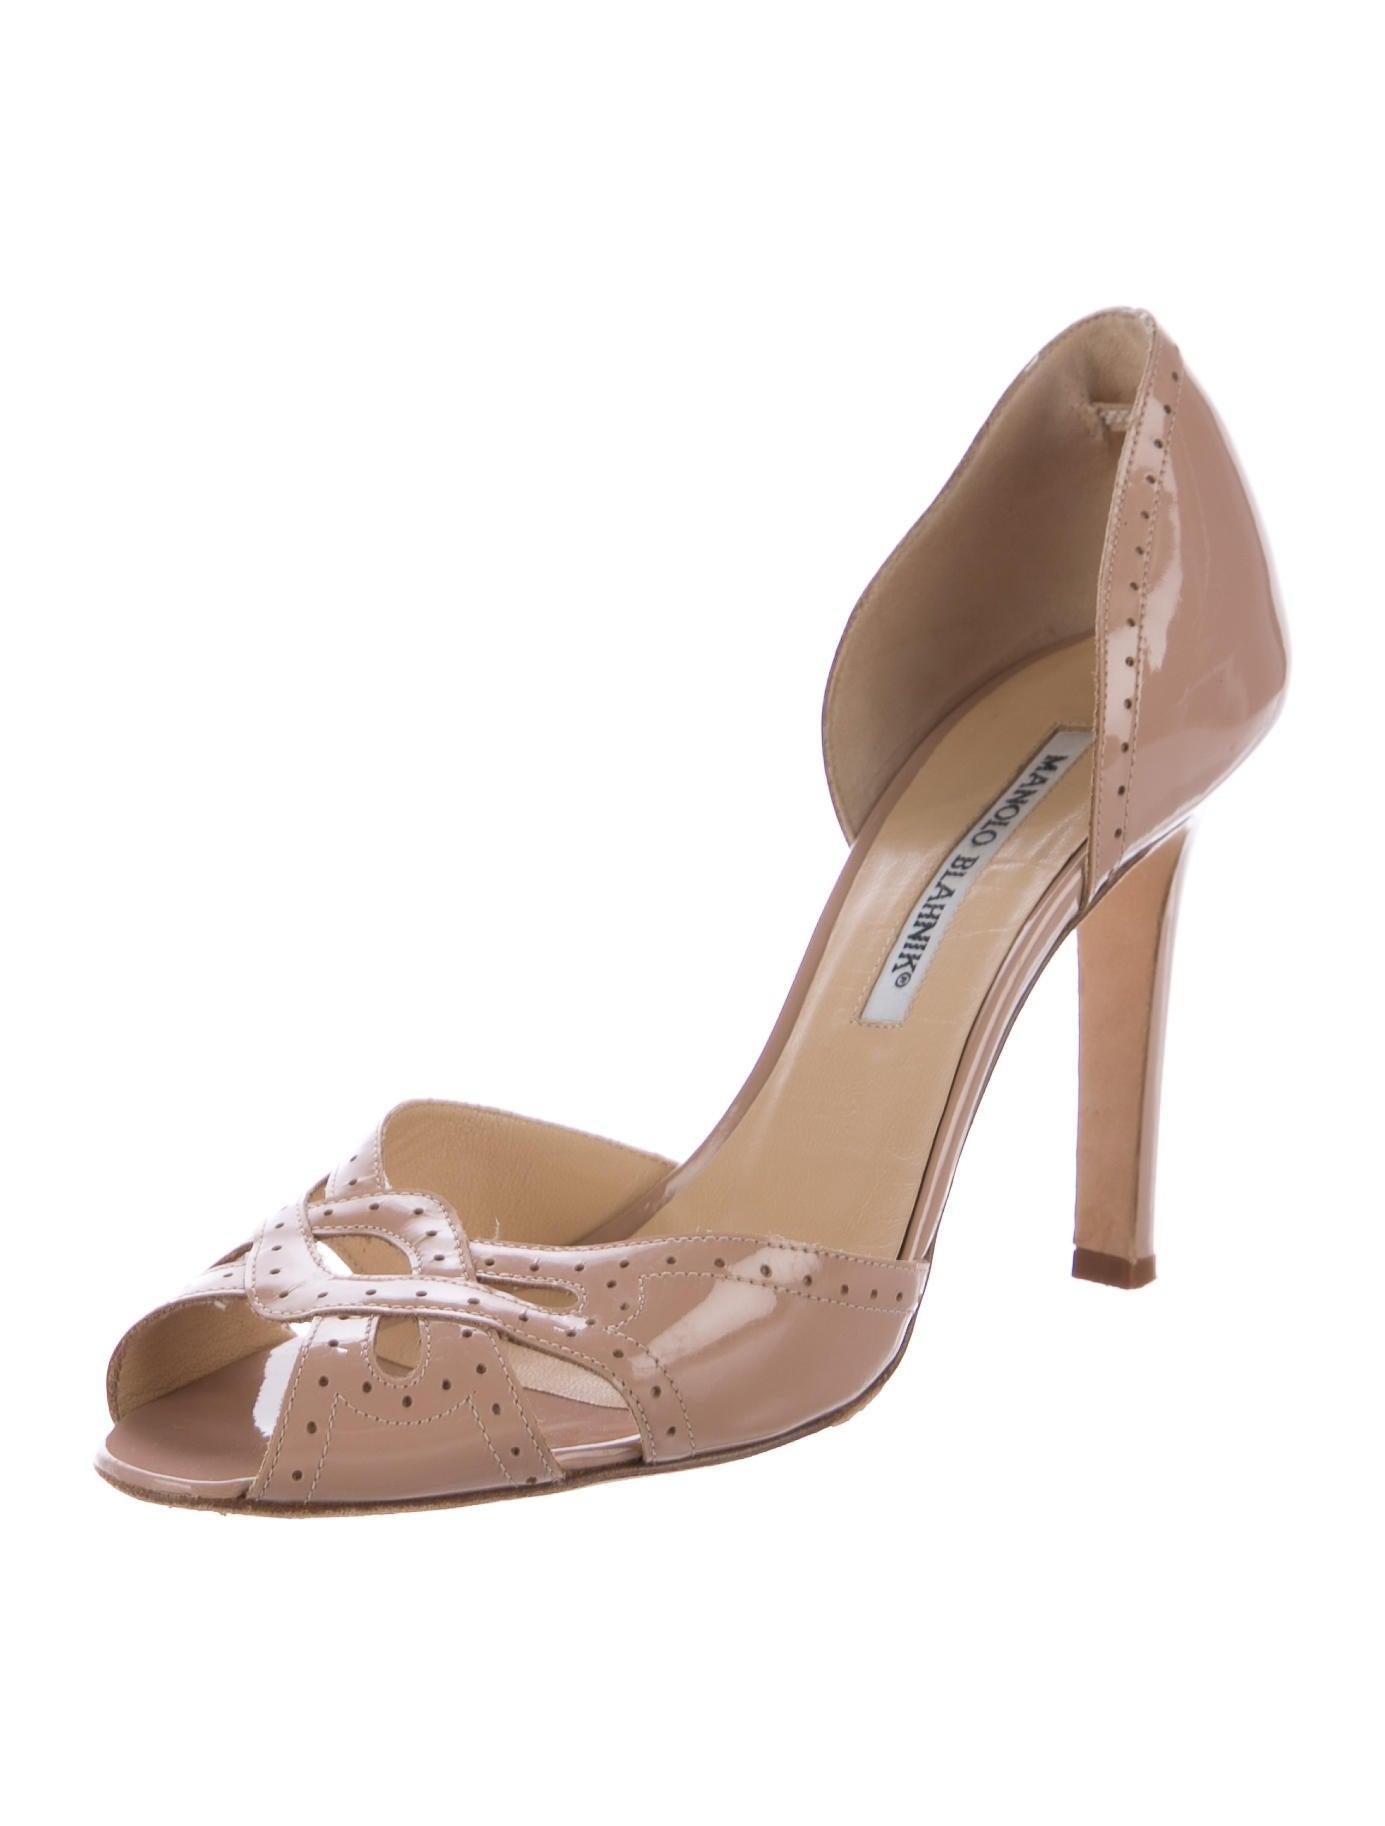 Manolo blahnik peep toe d 39 orsay pumps shoes moo70837 for Shoes by manolo blahnik